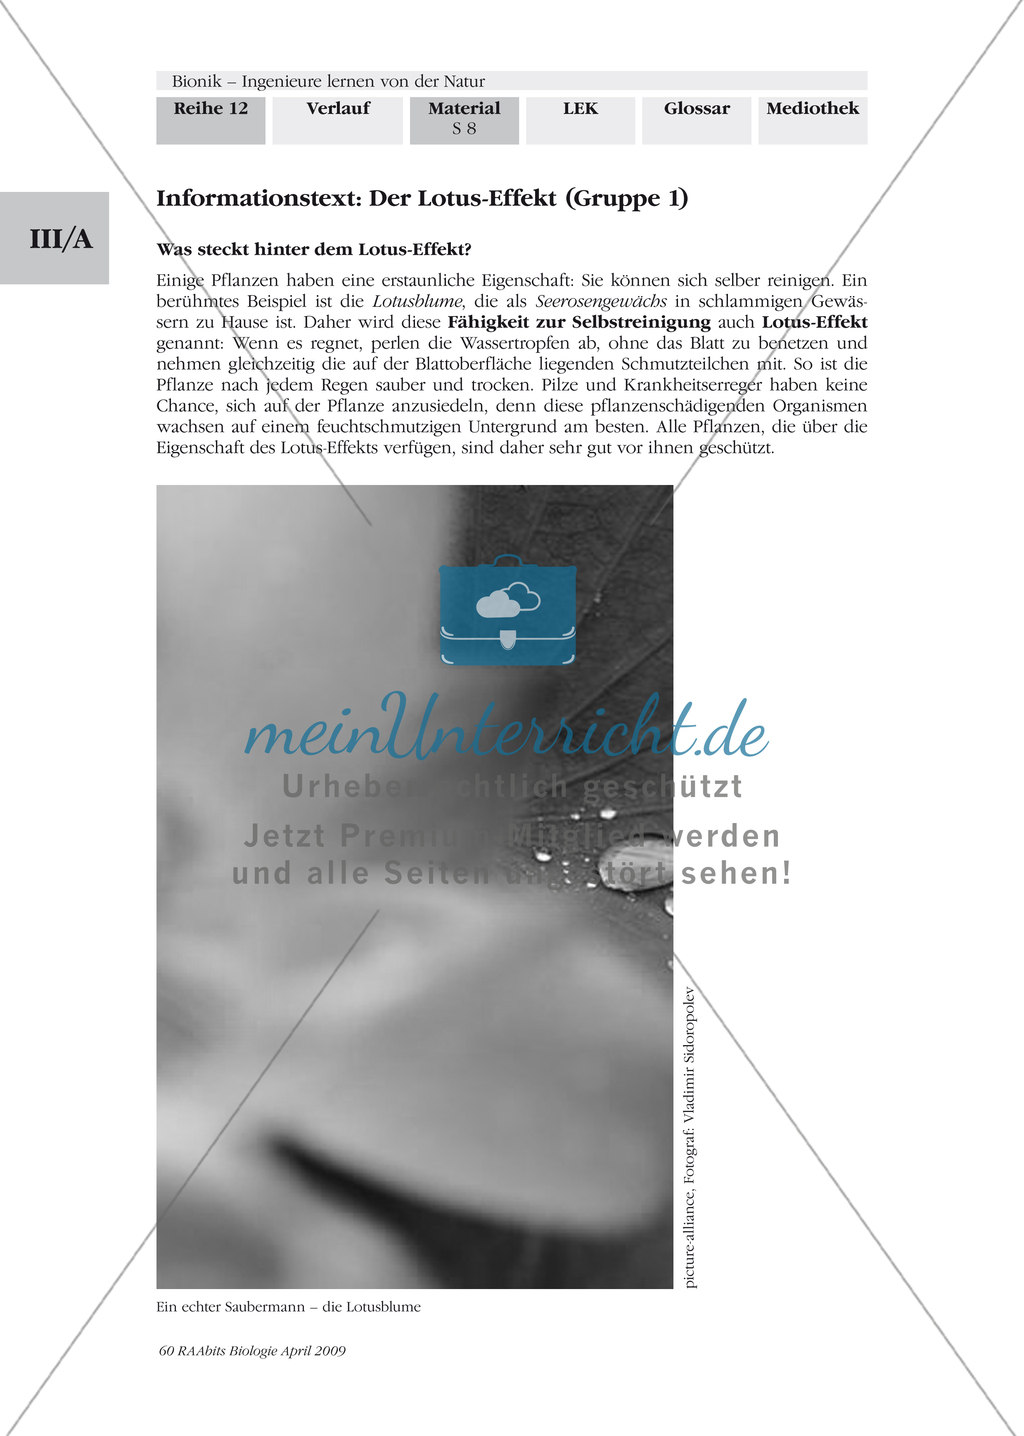 Bionik: Der Lotus-Effekt - Wandplakat Preview 2